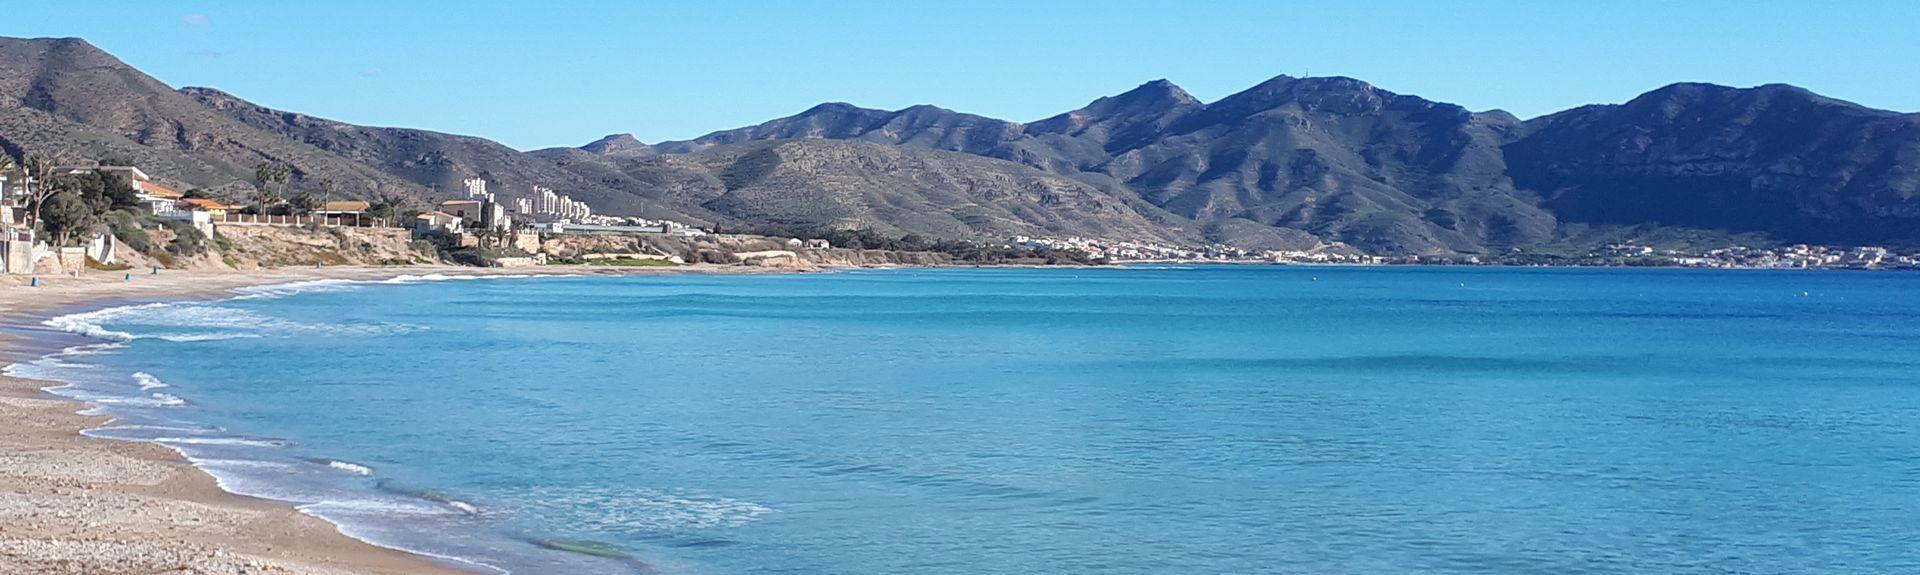 La Azohia, Murcia, Spanien